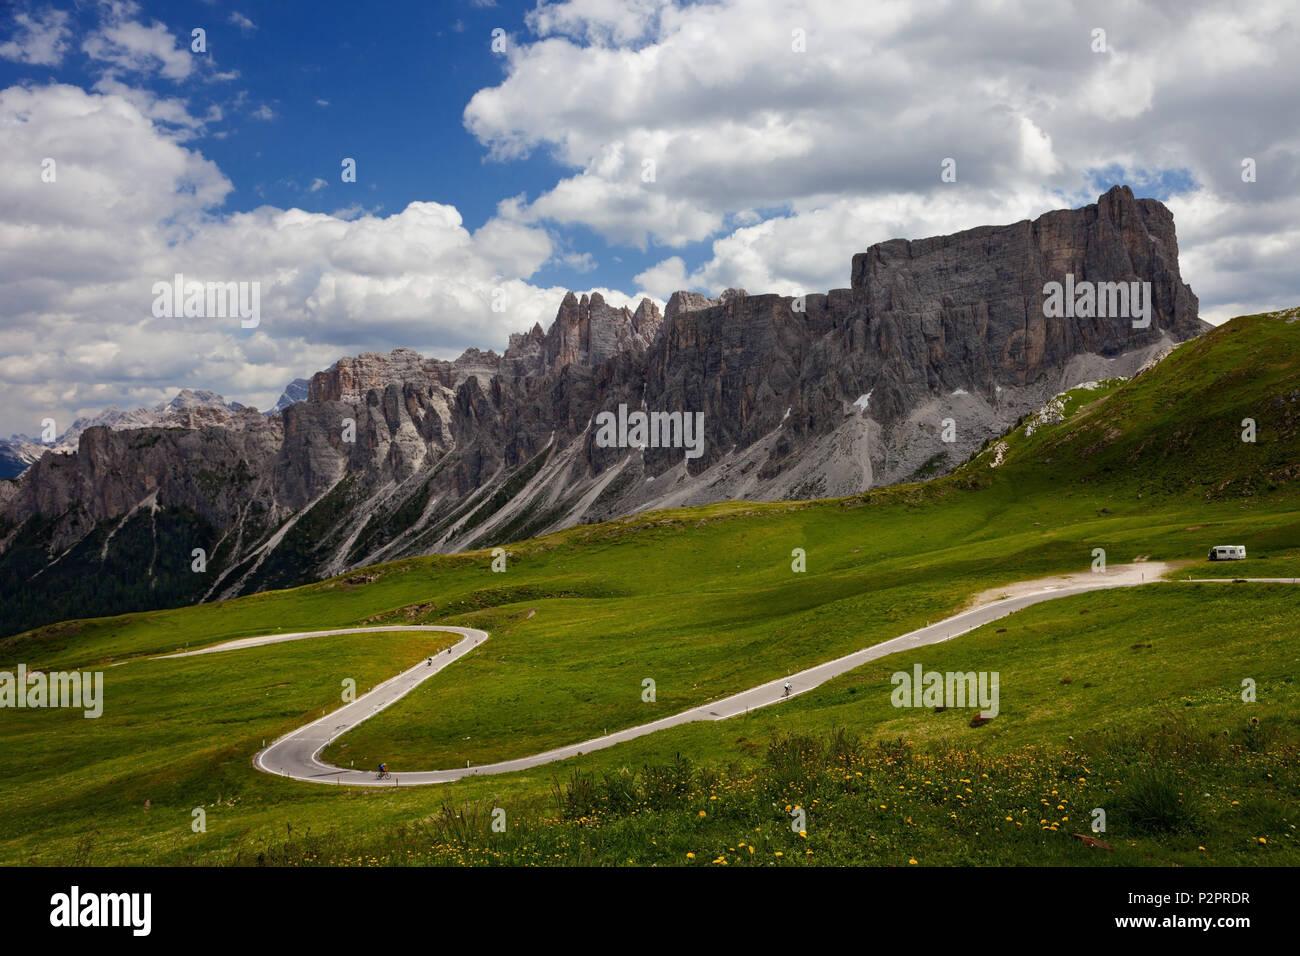 Summer, Pass Road, Passo Giau, Alps, Dolomites, Belluno, Italy - Stock Image